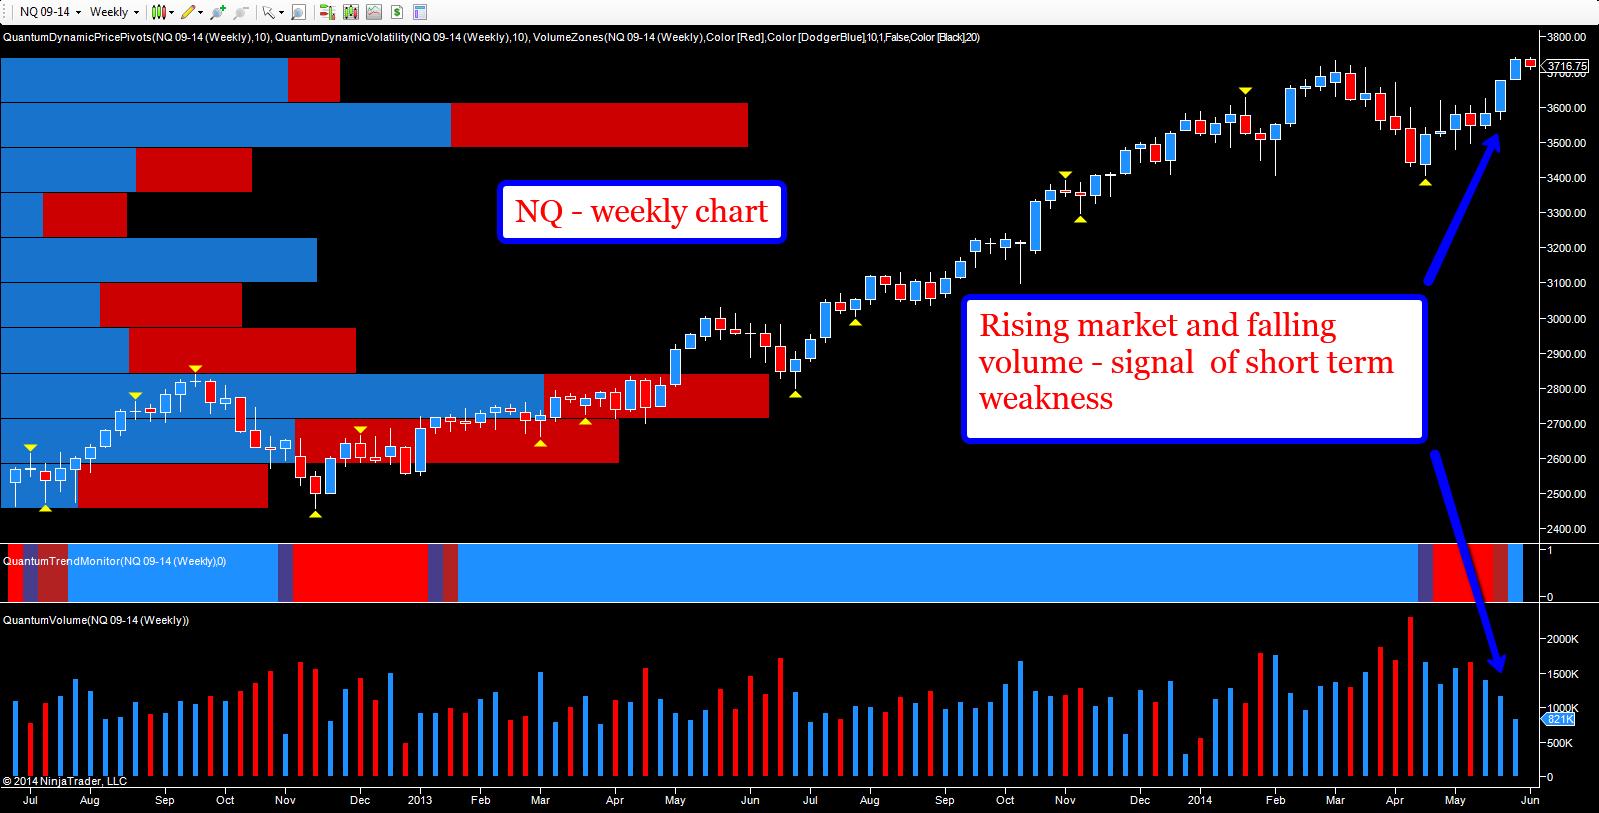 NQ - weekly chart